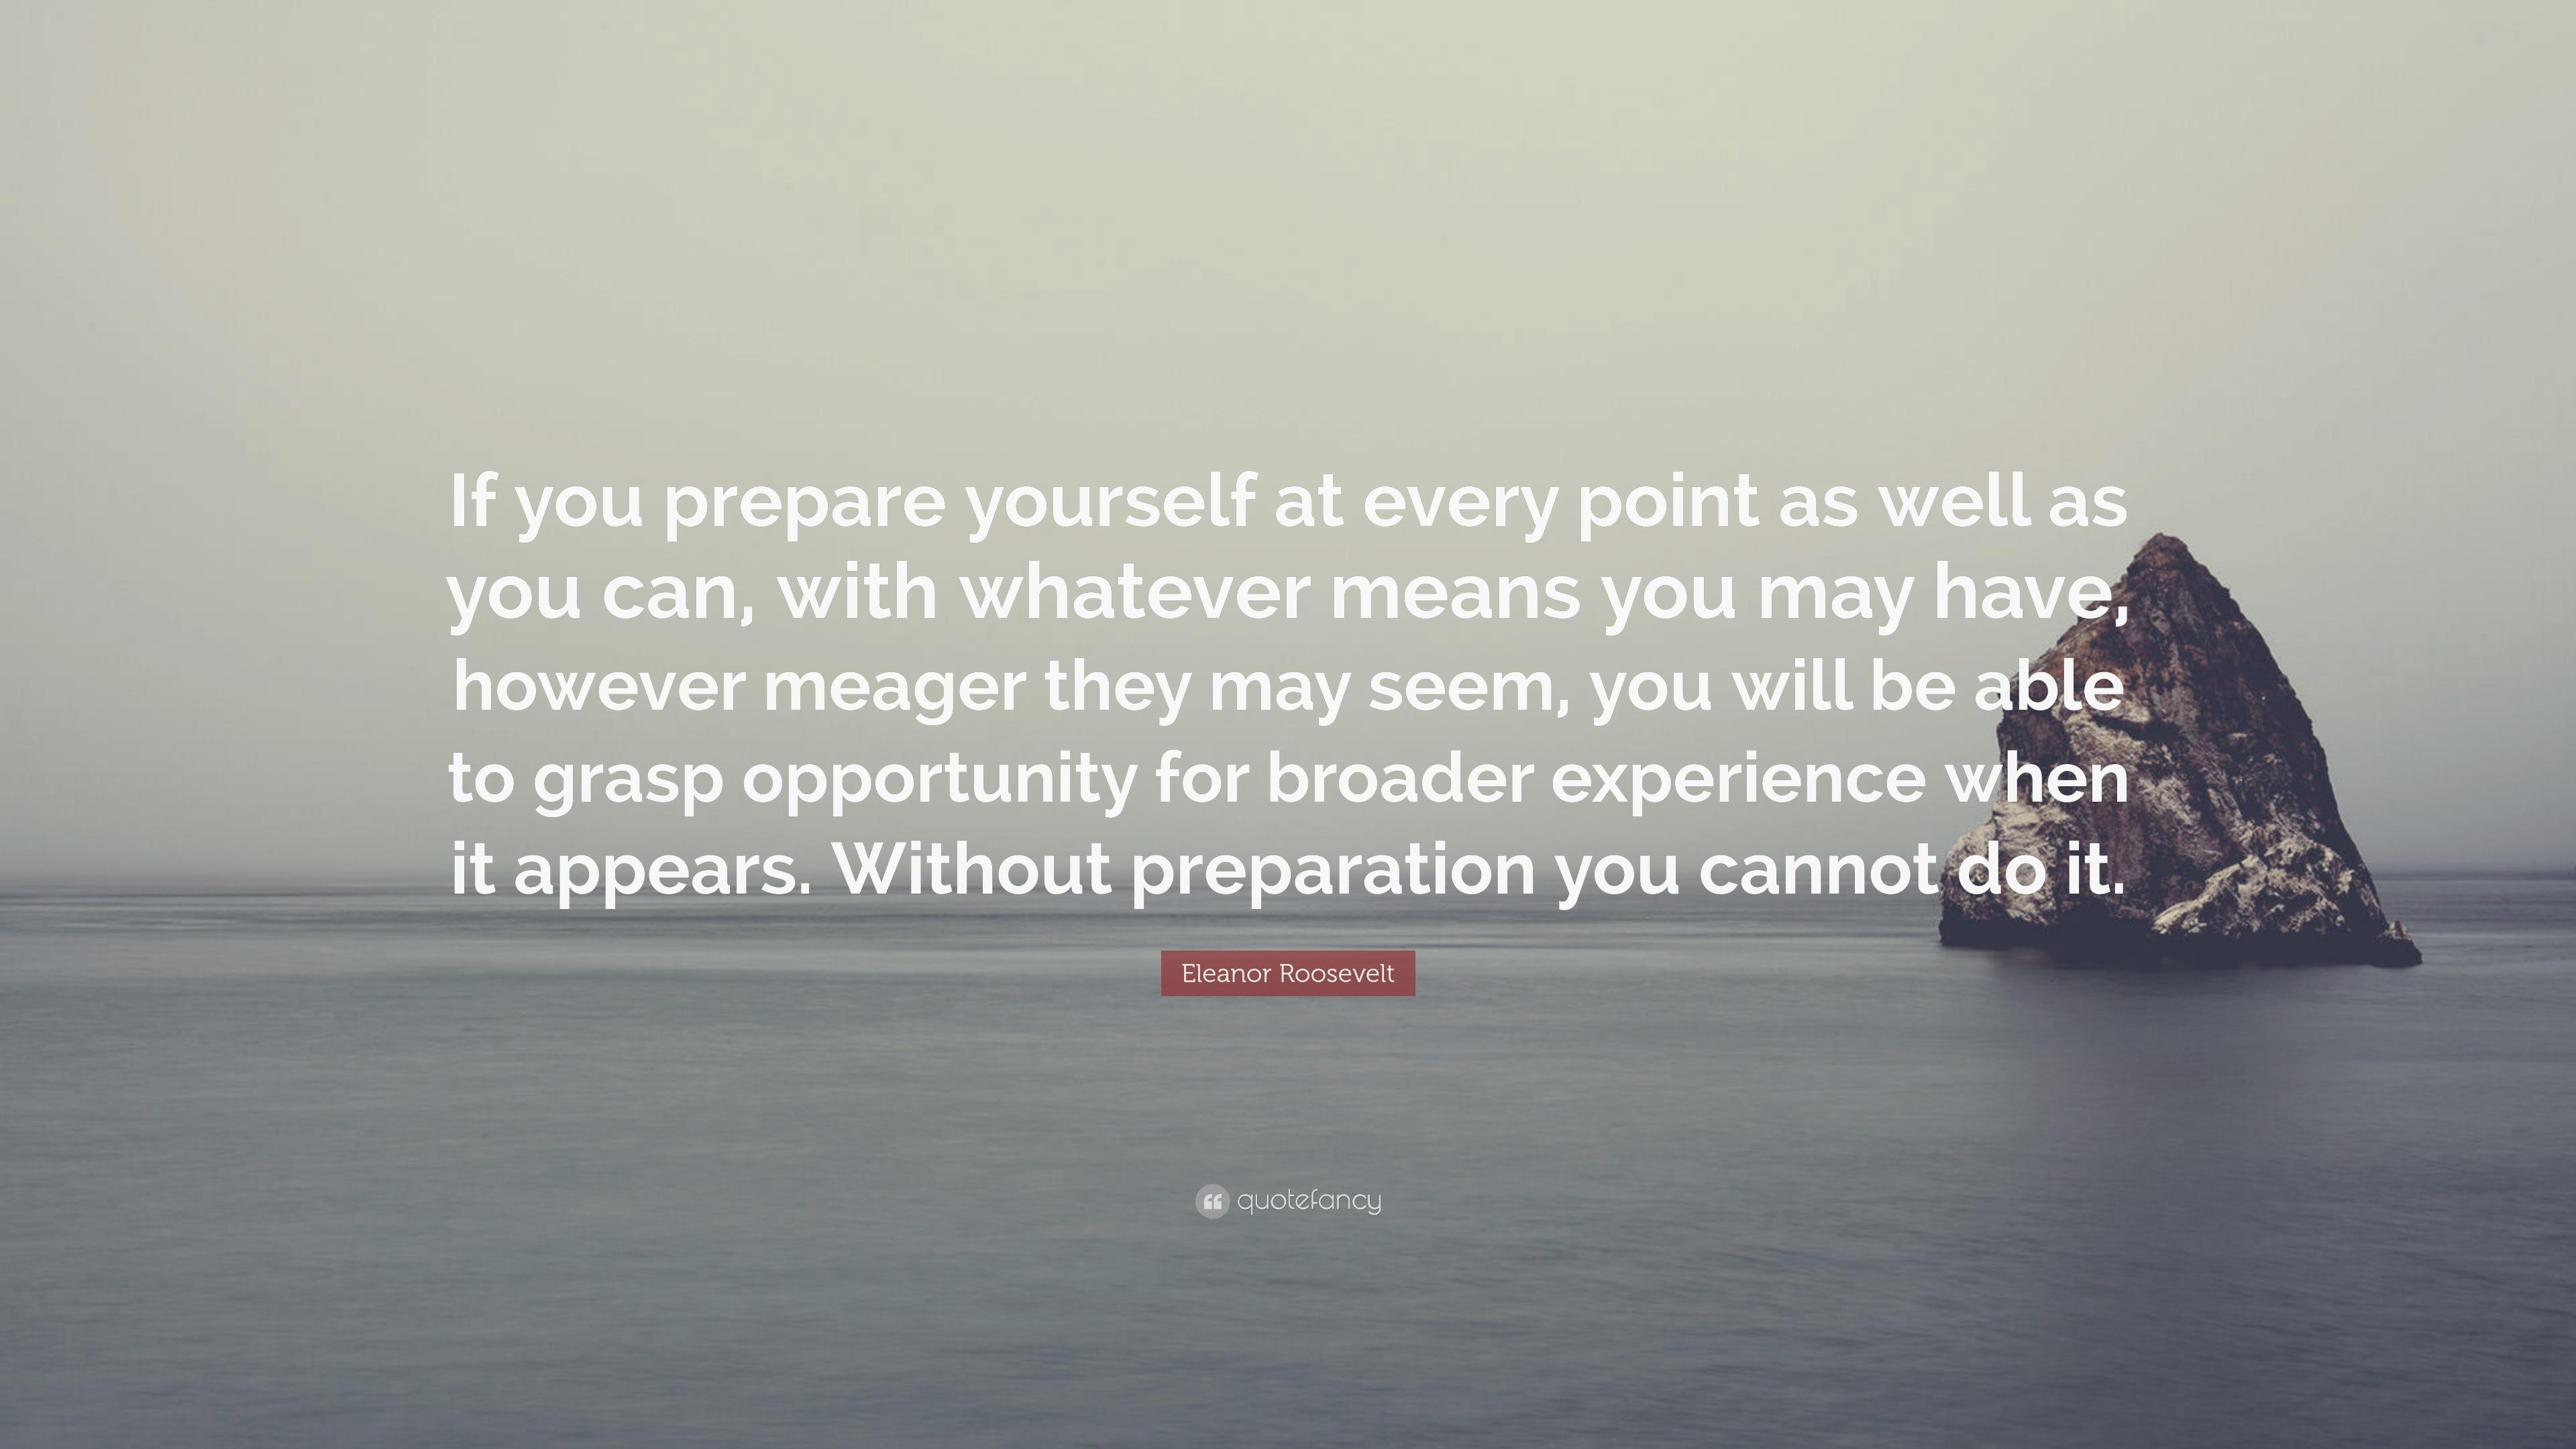 Eleanor roosevelt quote if you prepare yourself at every point as eleanor roosevelt quote if you prepare yourself at every point as well as you solutioingenieria Image collections